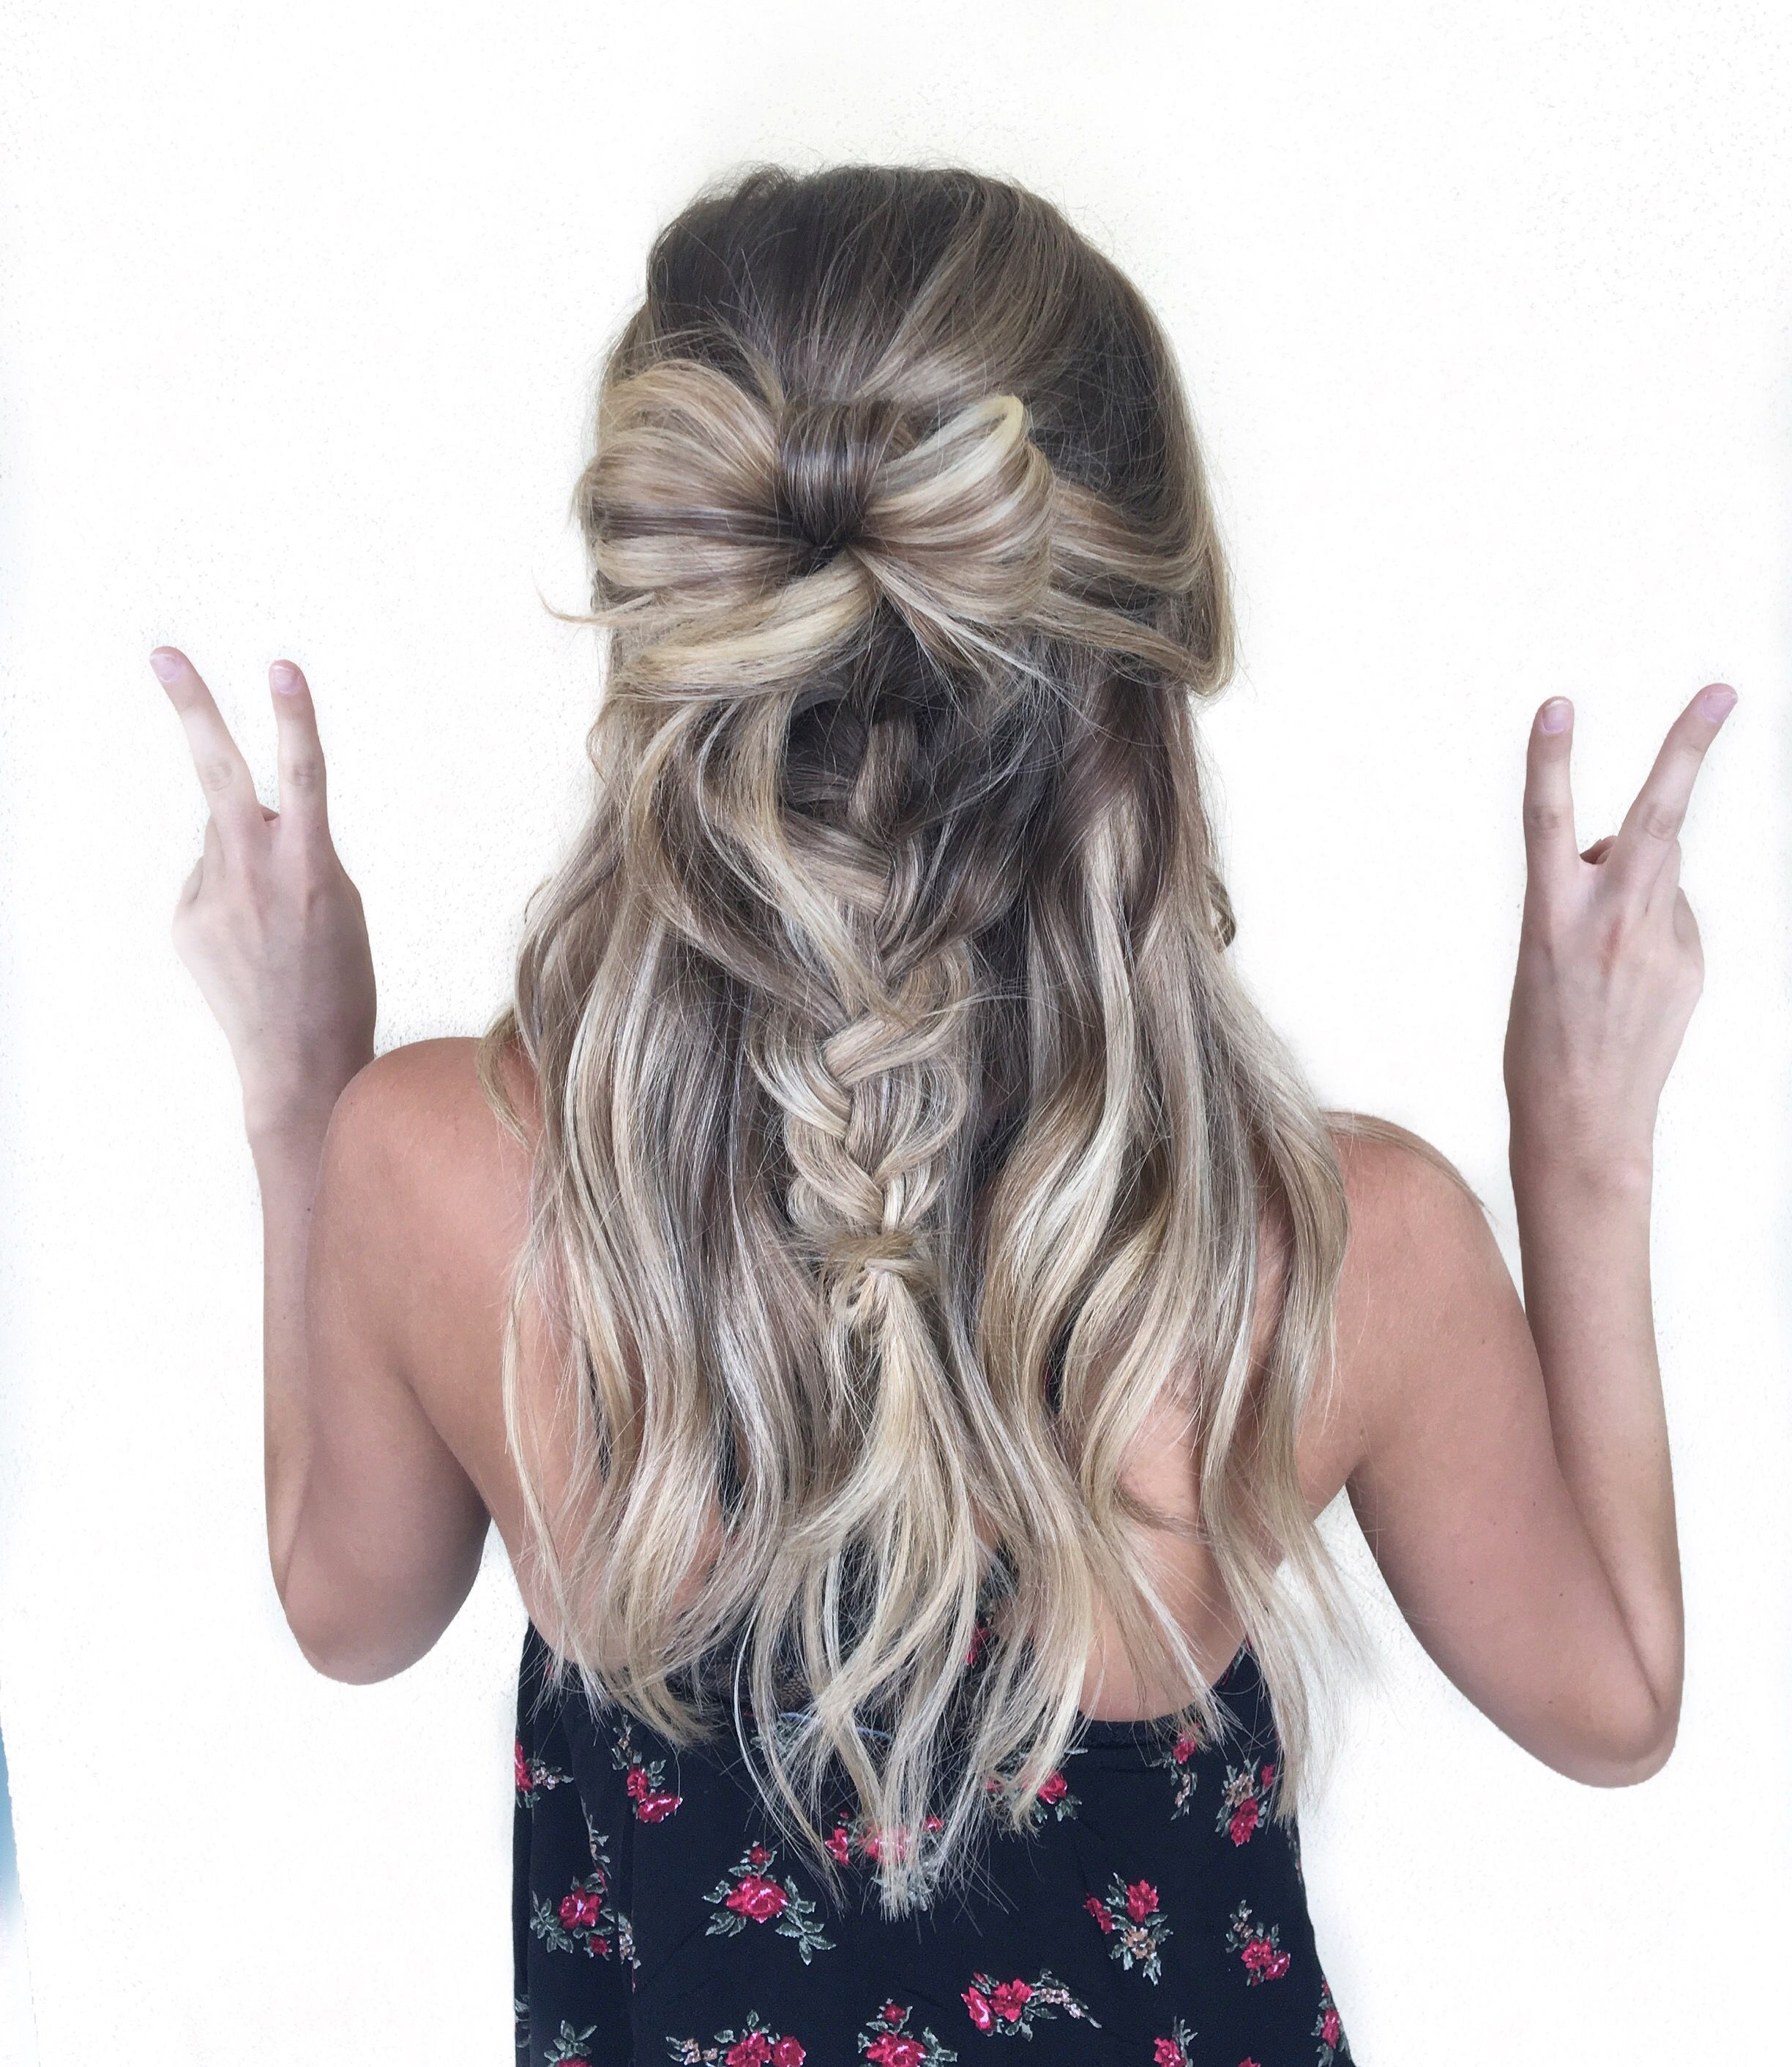 Cutest hairstyle braid ever bow hair by alexaa in az at habit